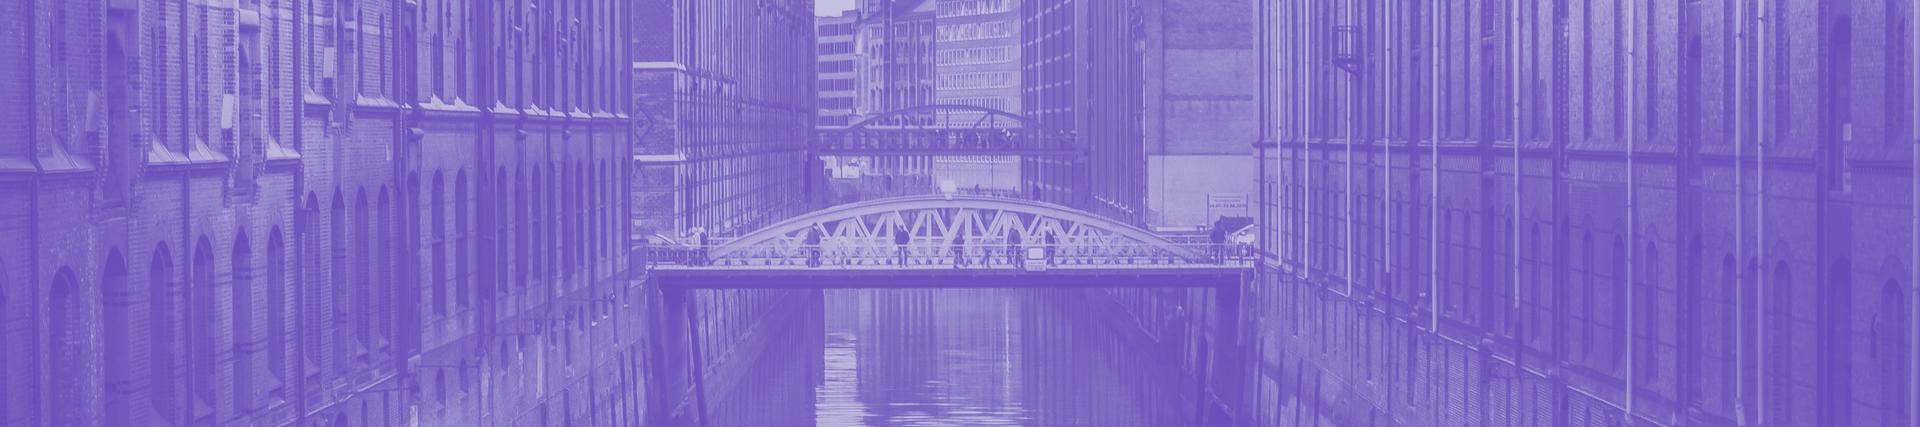 White Arc Bridge Between Building